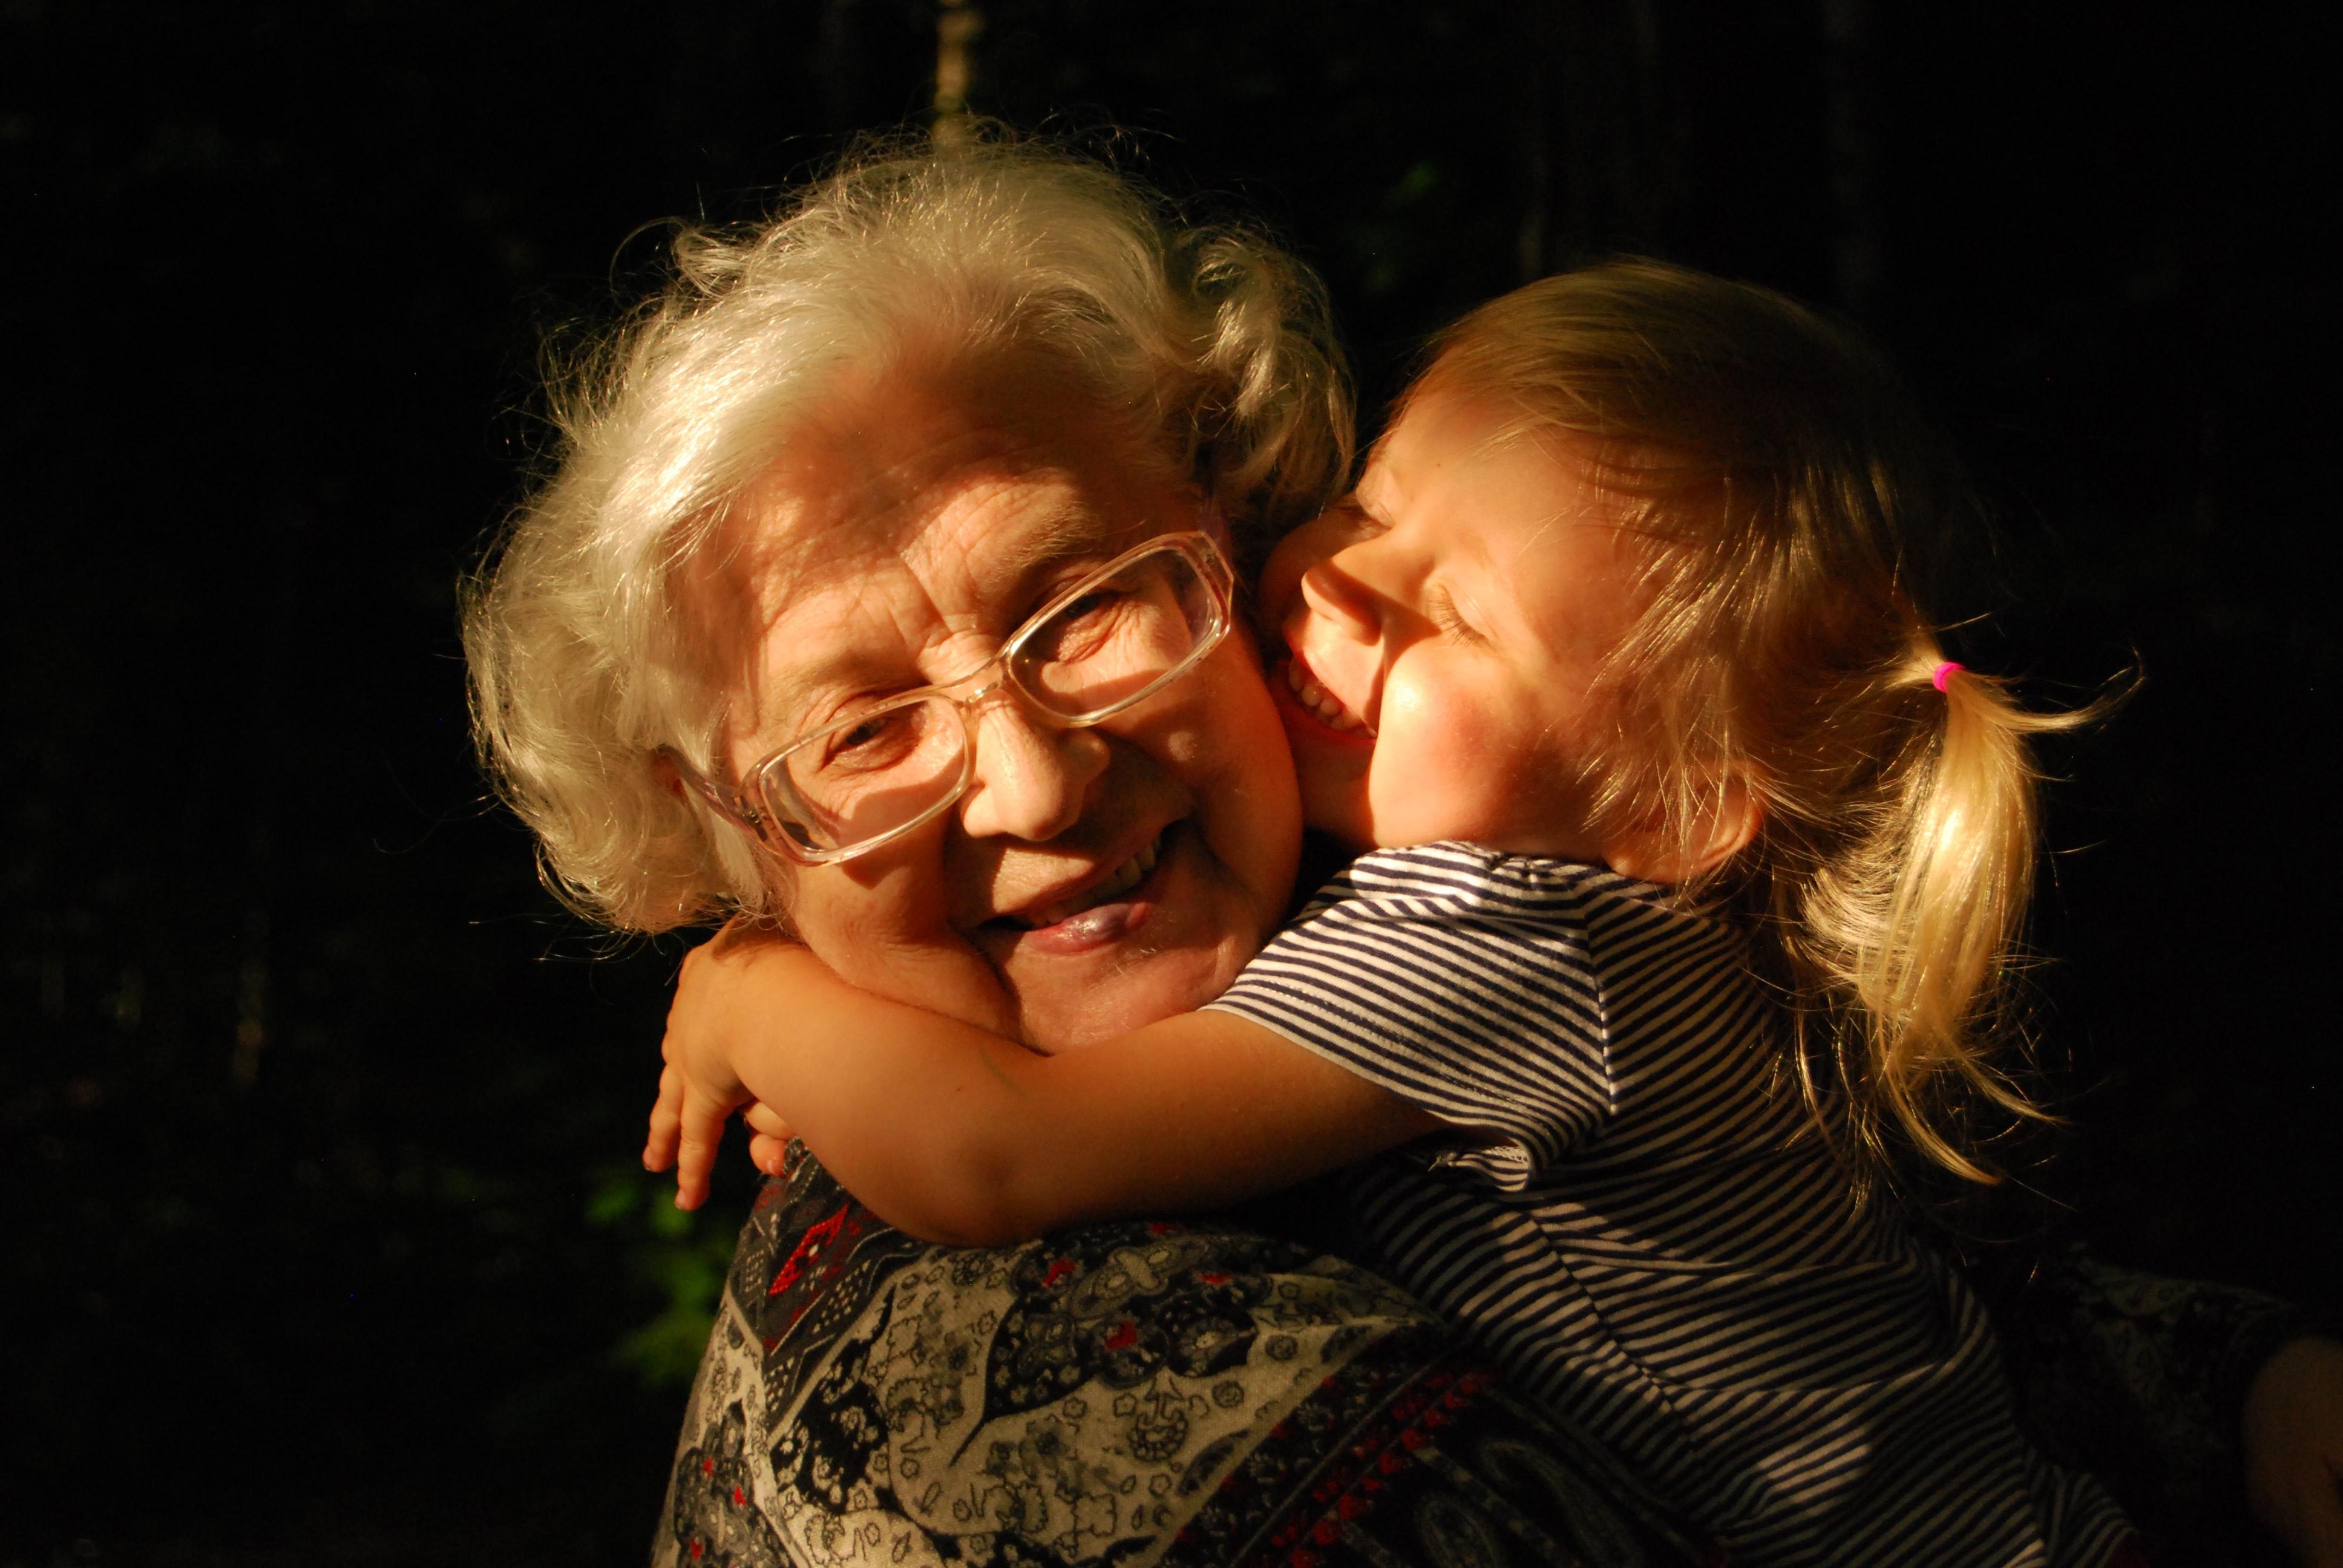 uma avó a abraçar a neta